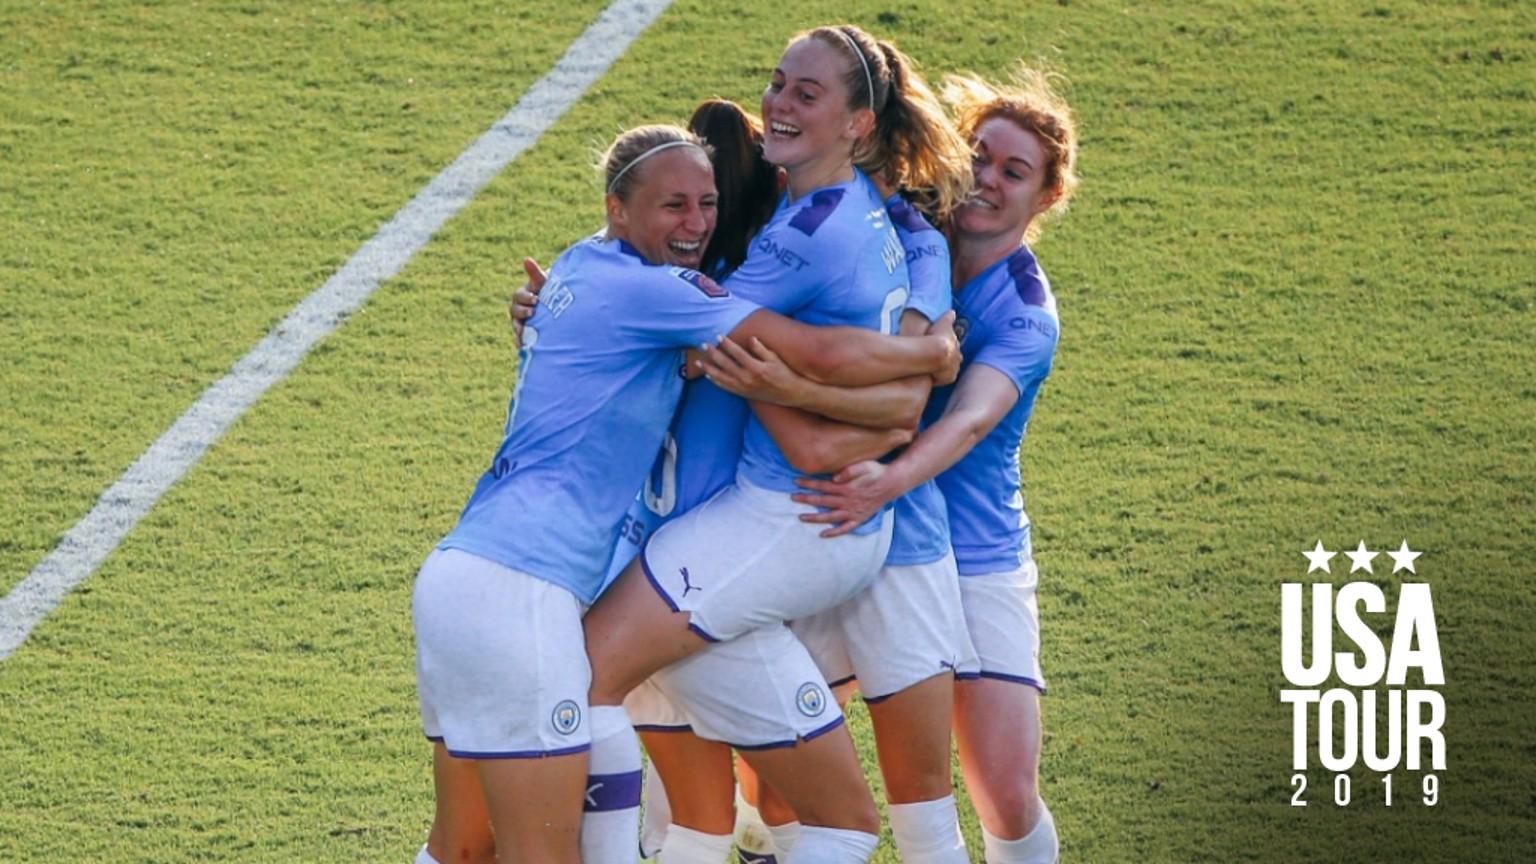 WULLAERT WINNER: City celebrate, as Tessa Wullaert nets in injury time